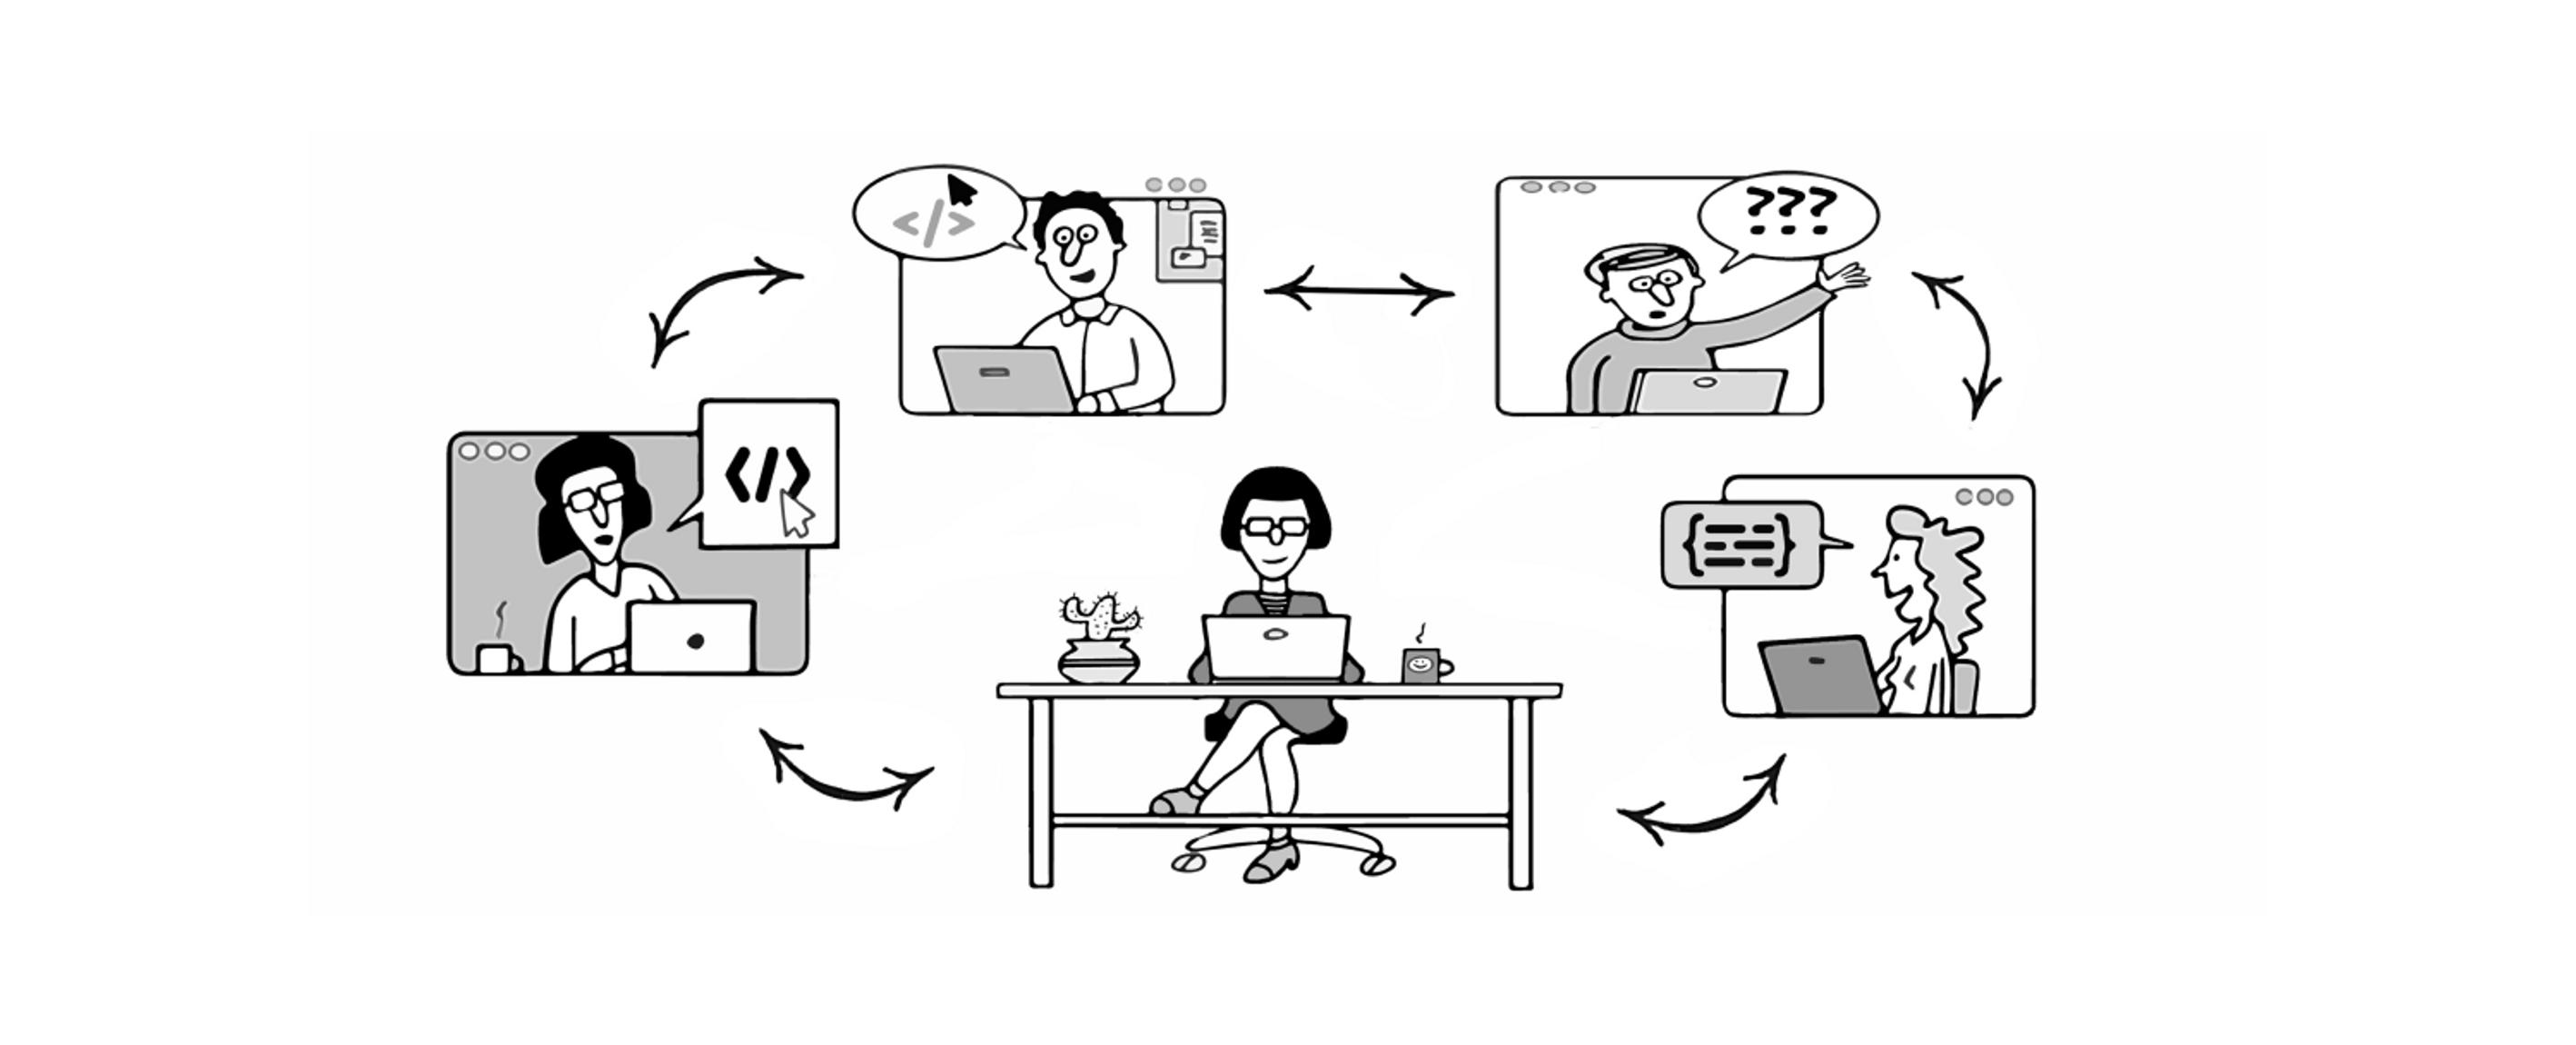 Cartoon on distributed technology team